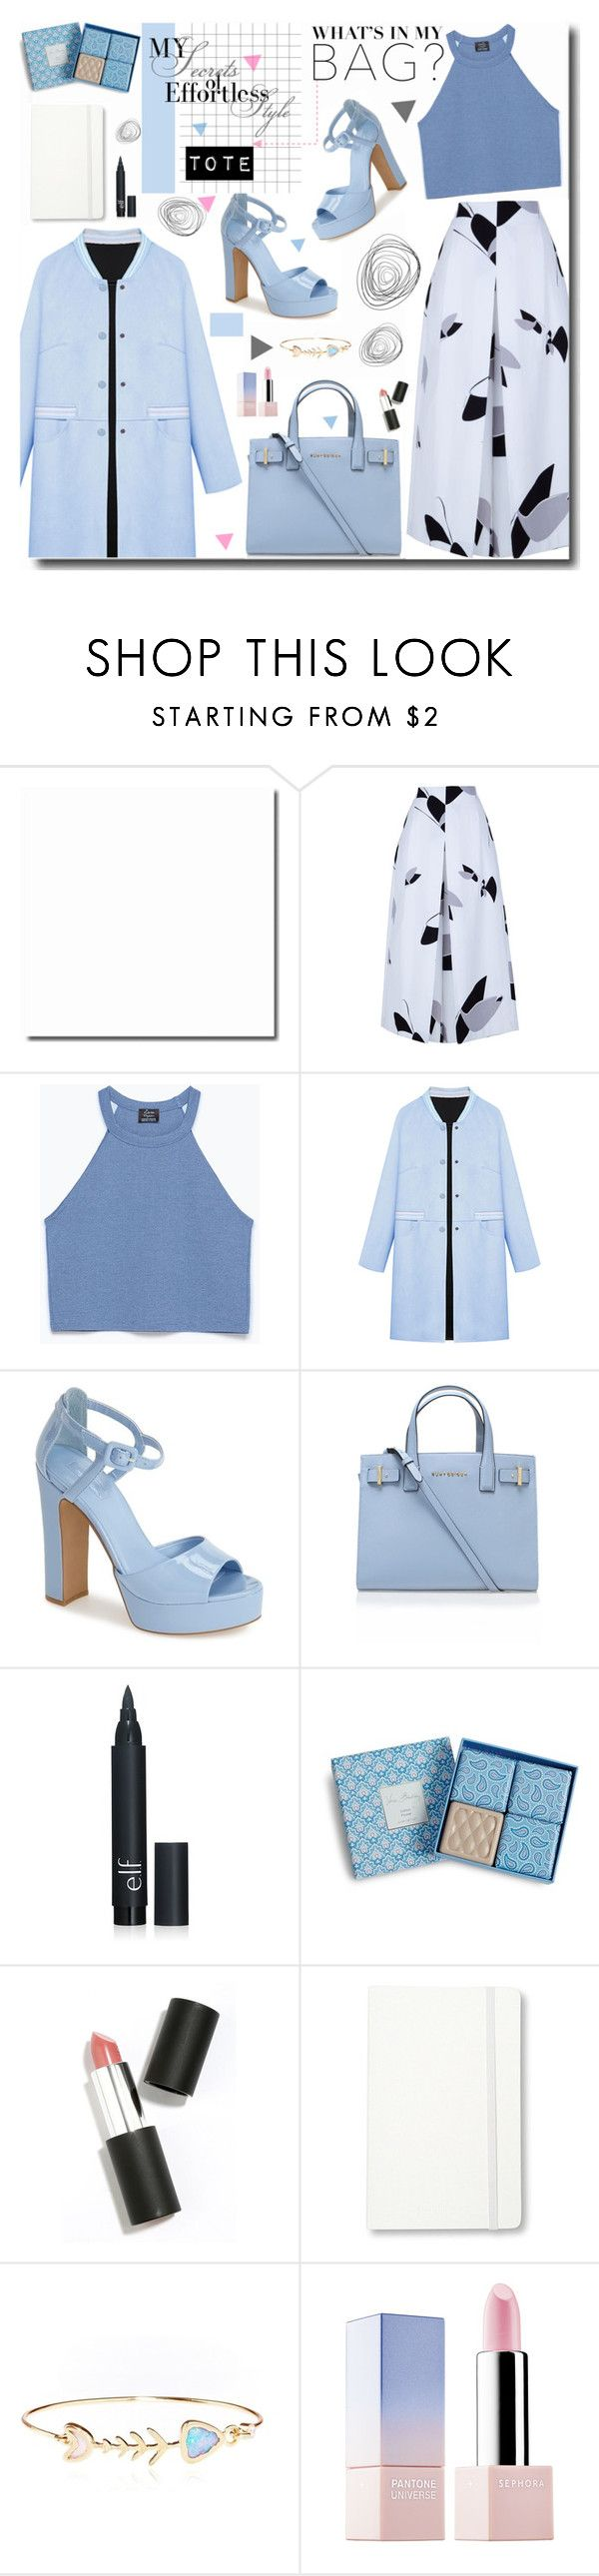 """Tote Bag"" by kts-desilva ❤ liked on Polyvore featuring mode, TIBI, Zara, WithChic, Topshop, Kurt Geiger, Vera Bradley, Sigma Beauty, Moleskine et Sephora Collection"